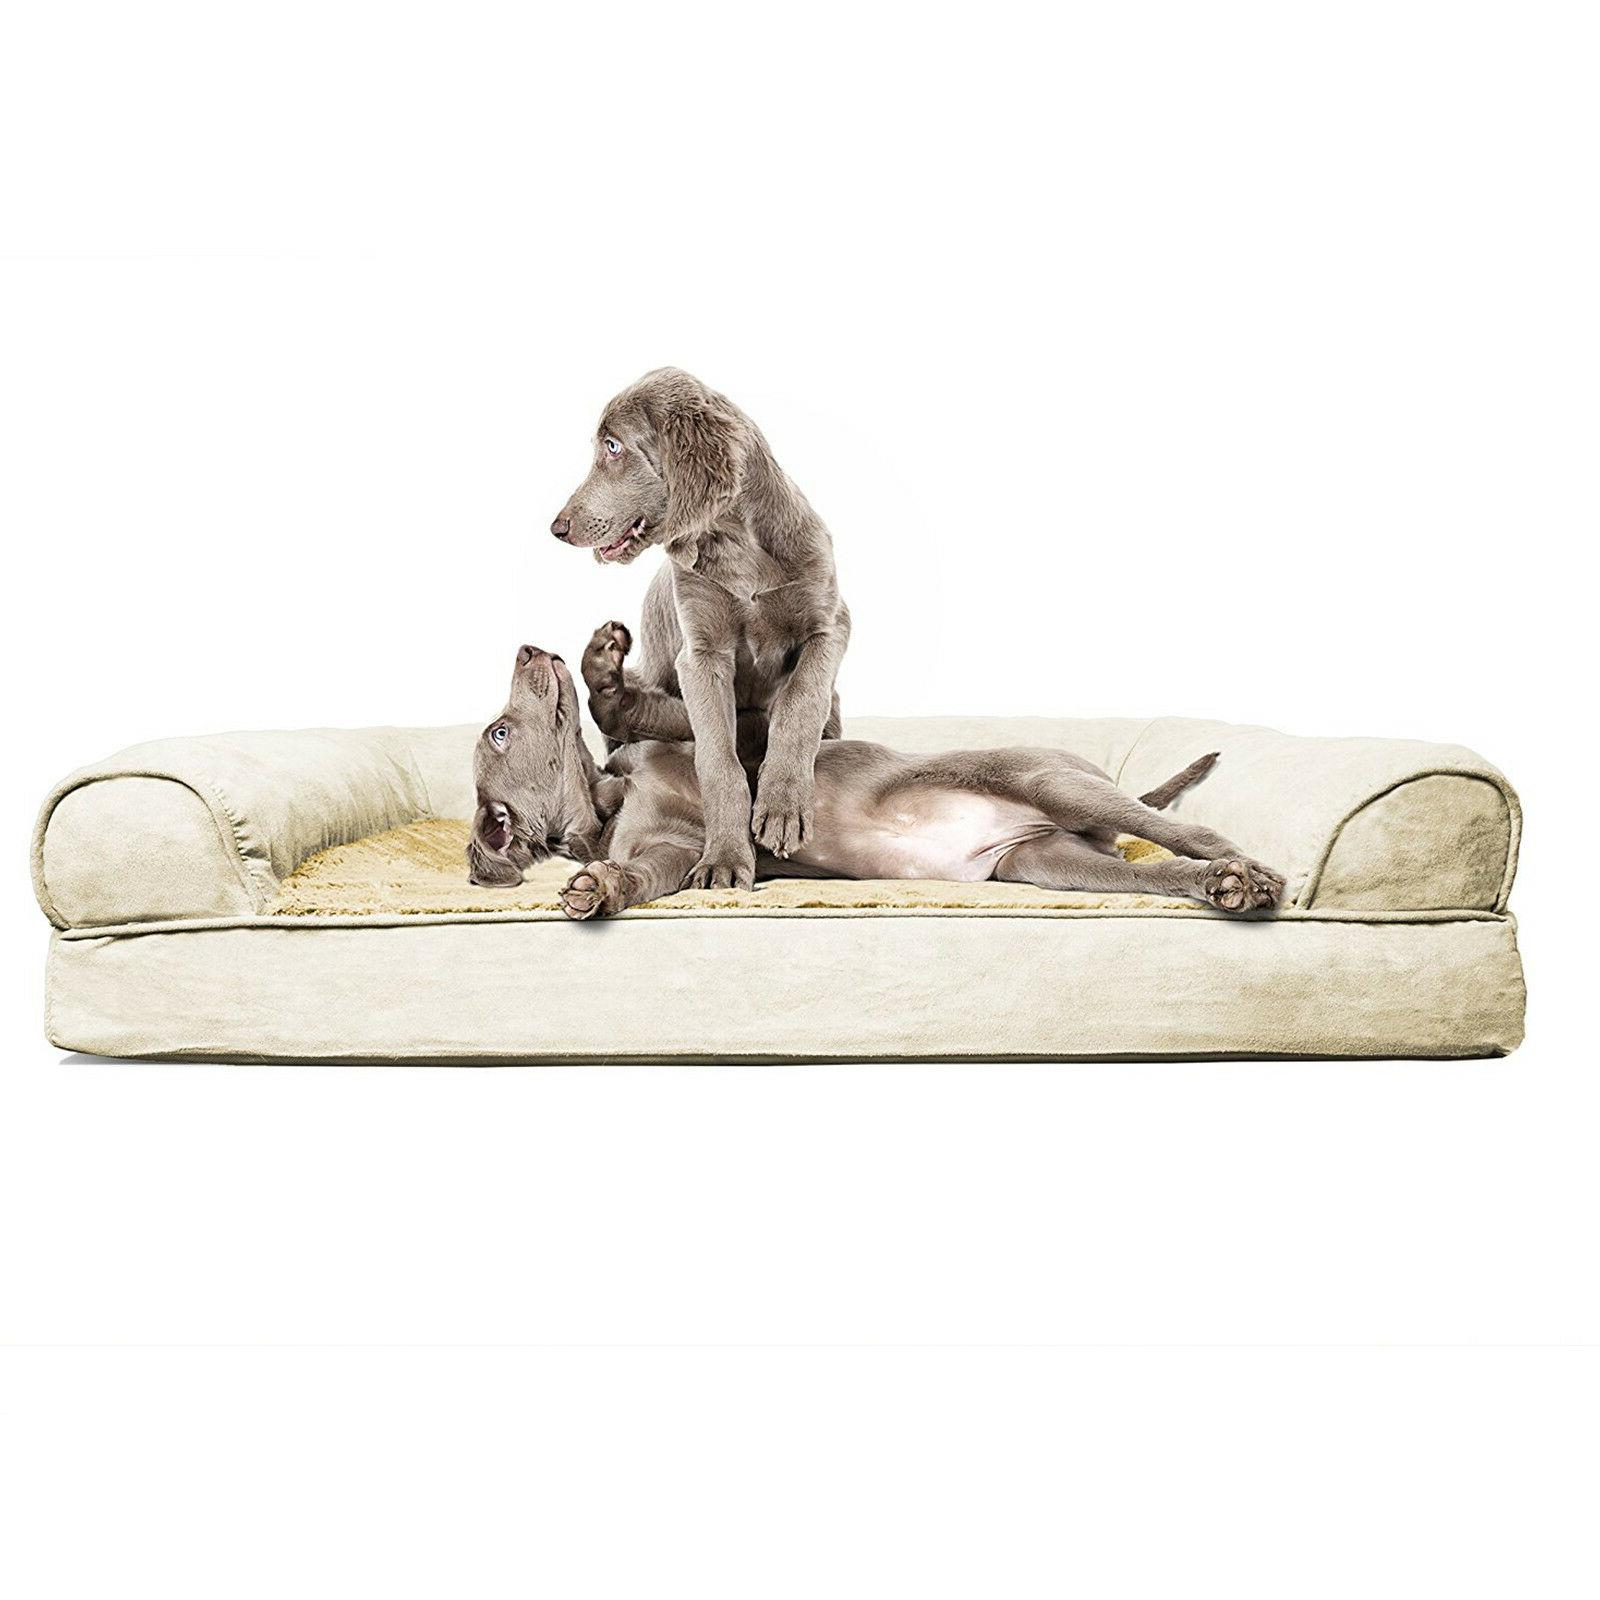 Orthopedic Sofa Foam Pets Comfortable Large Jumbo New